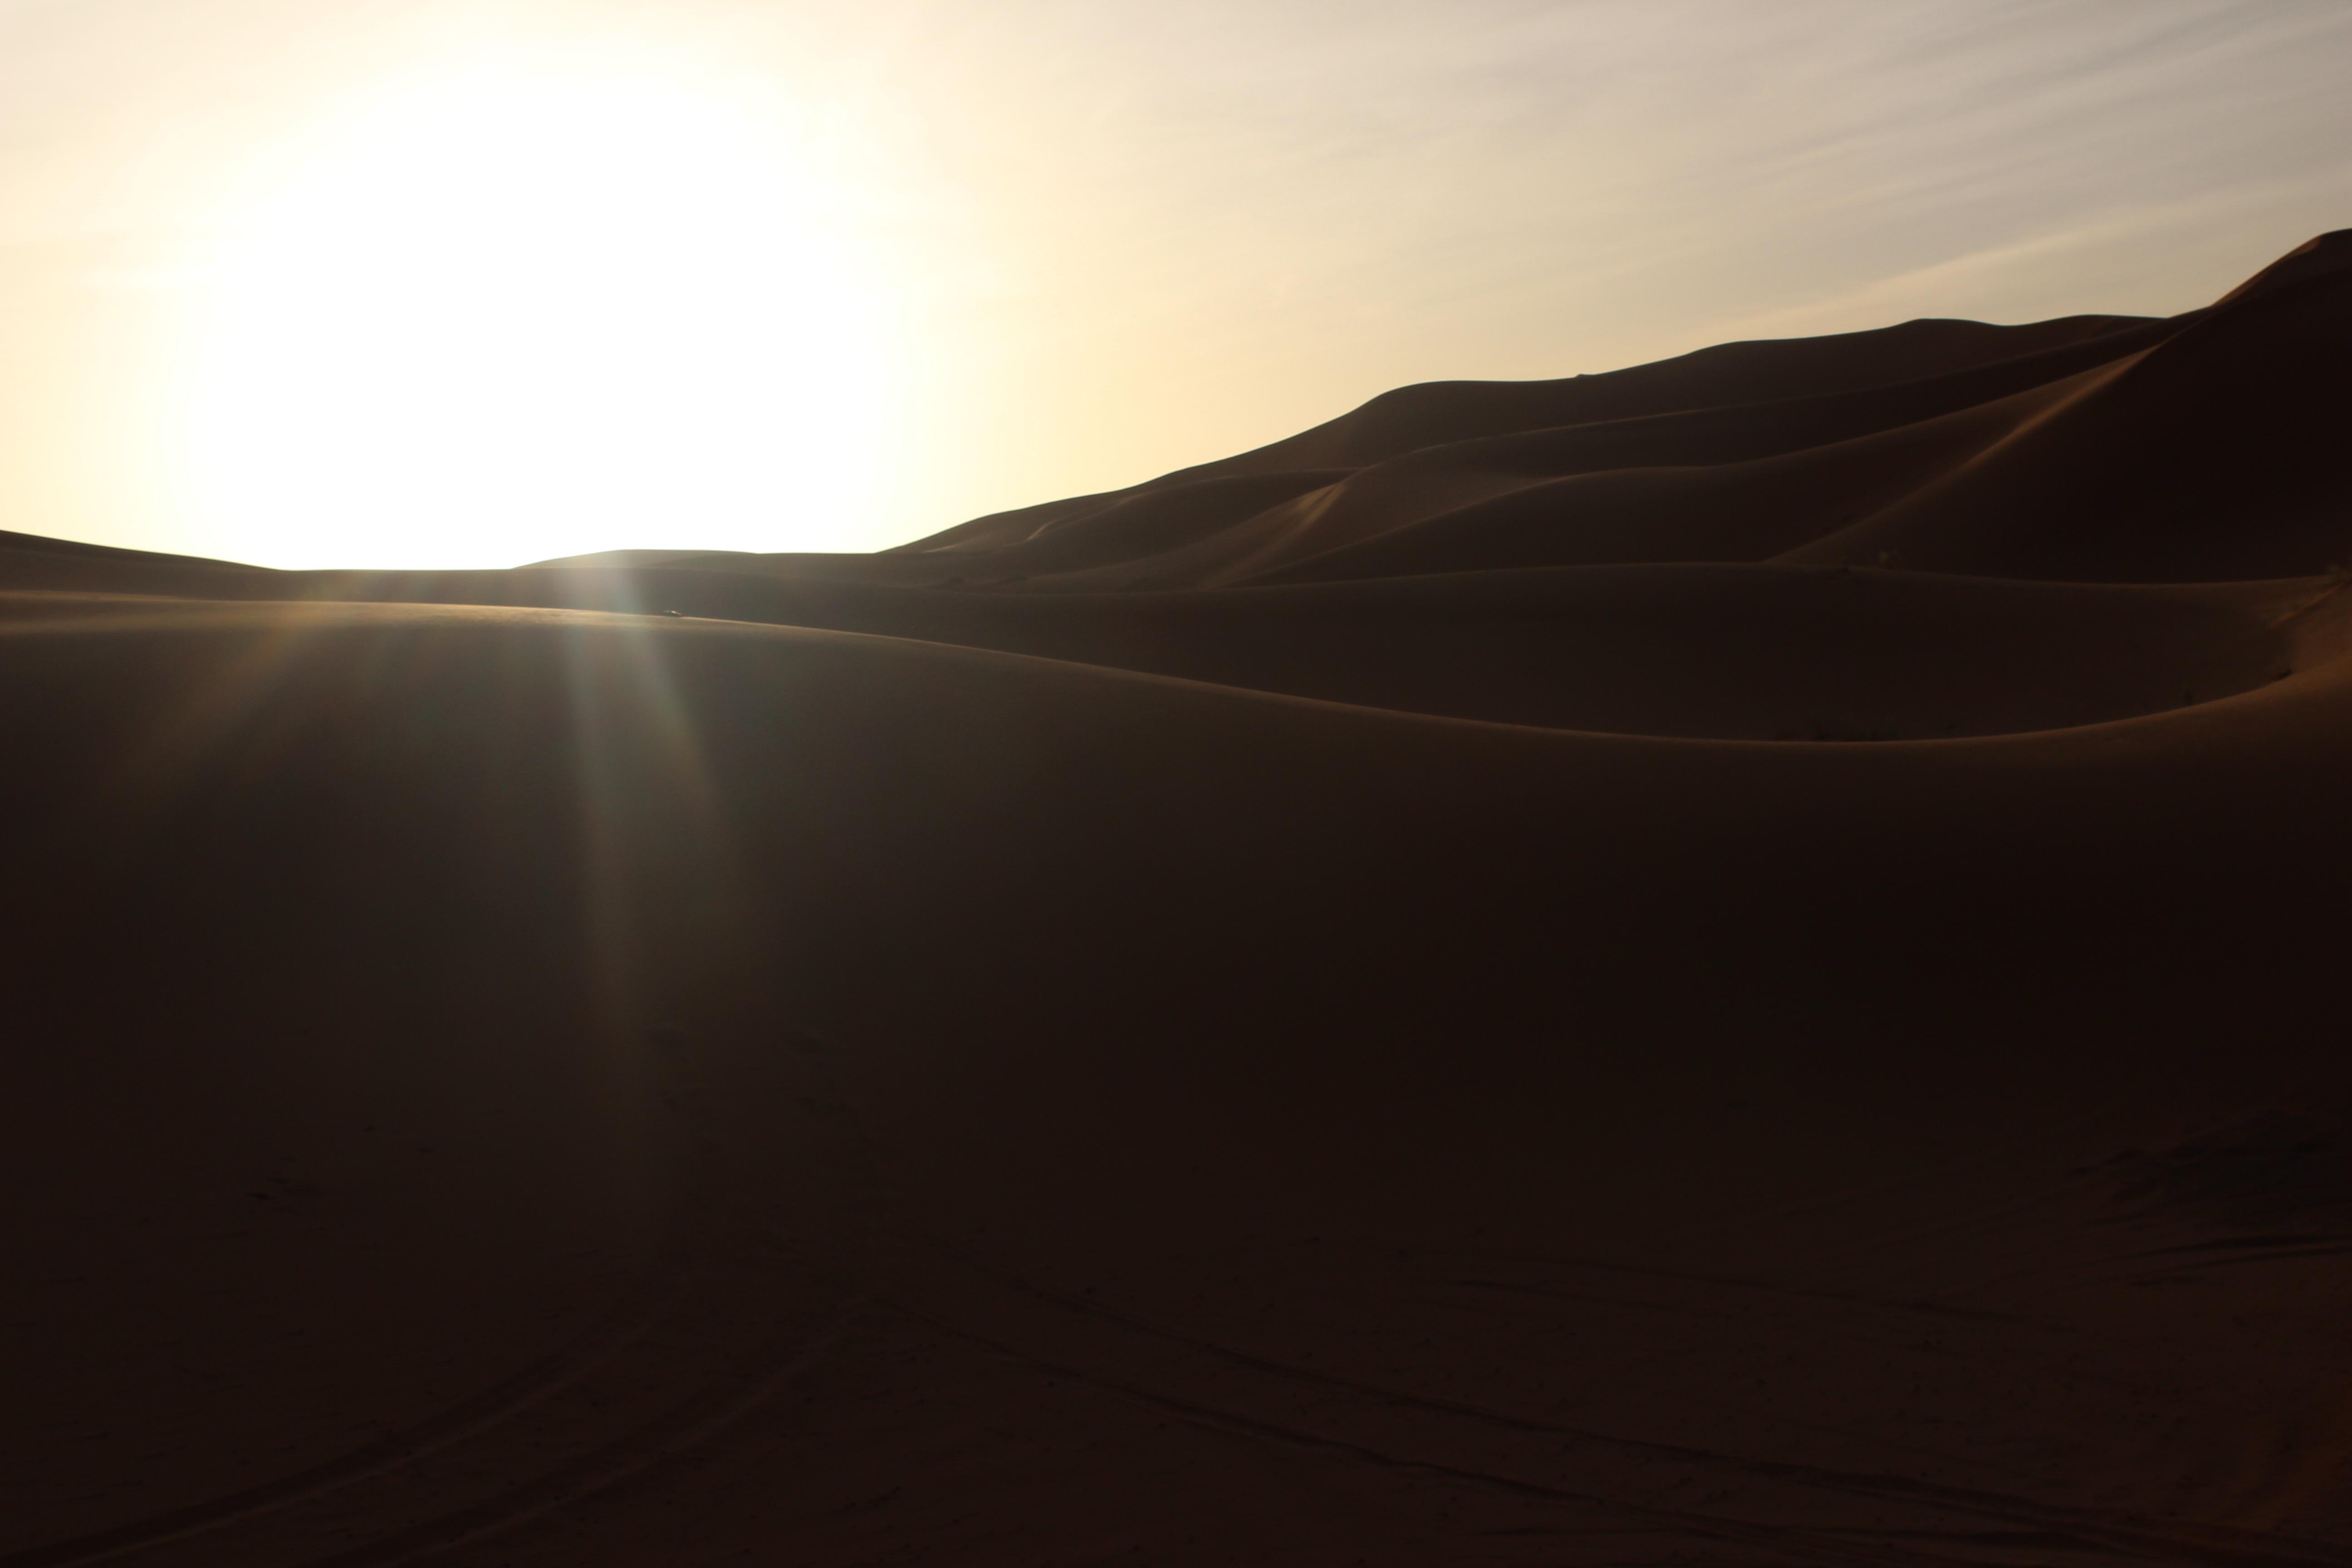 Lost, Curve, Curvy, Desert, Deserted, HQ Photo